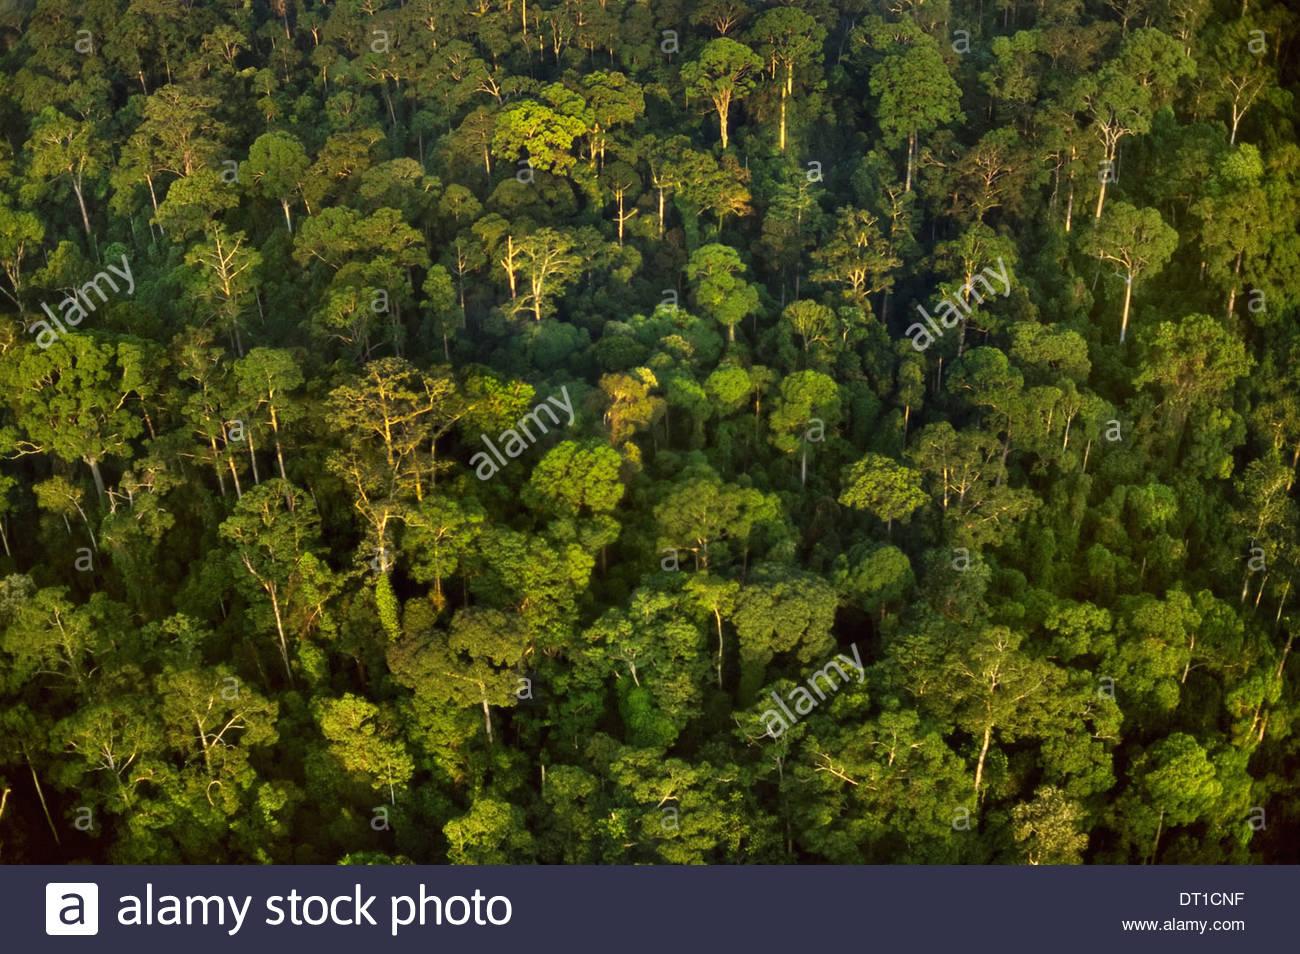 Borneo Lowland rainforest aerial Borneo - Stock Image